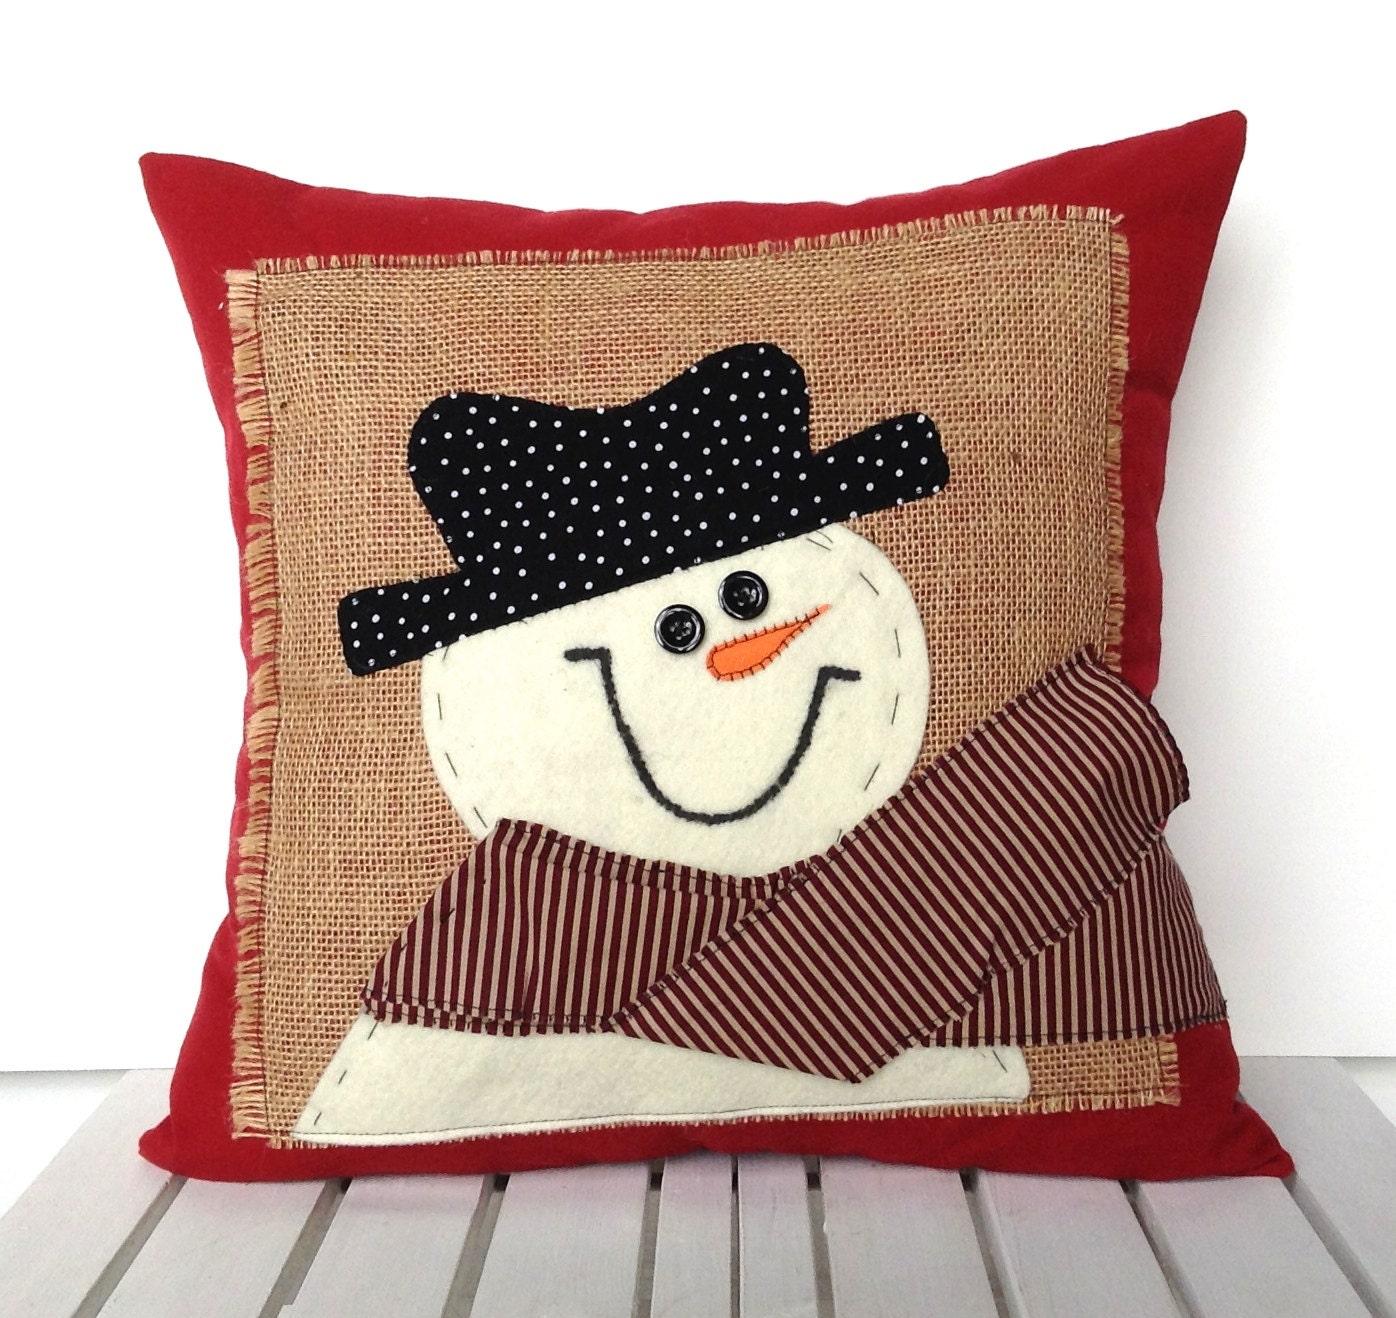 Decorative Christmas Pillows Throws : Snowman Christmas Pillow cover holiday pillow decorative